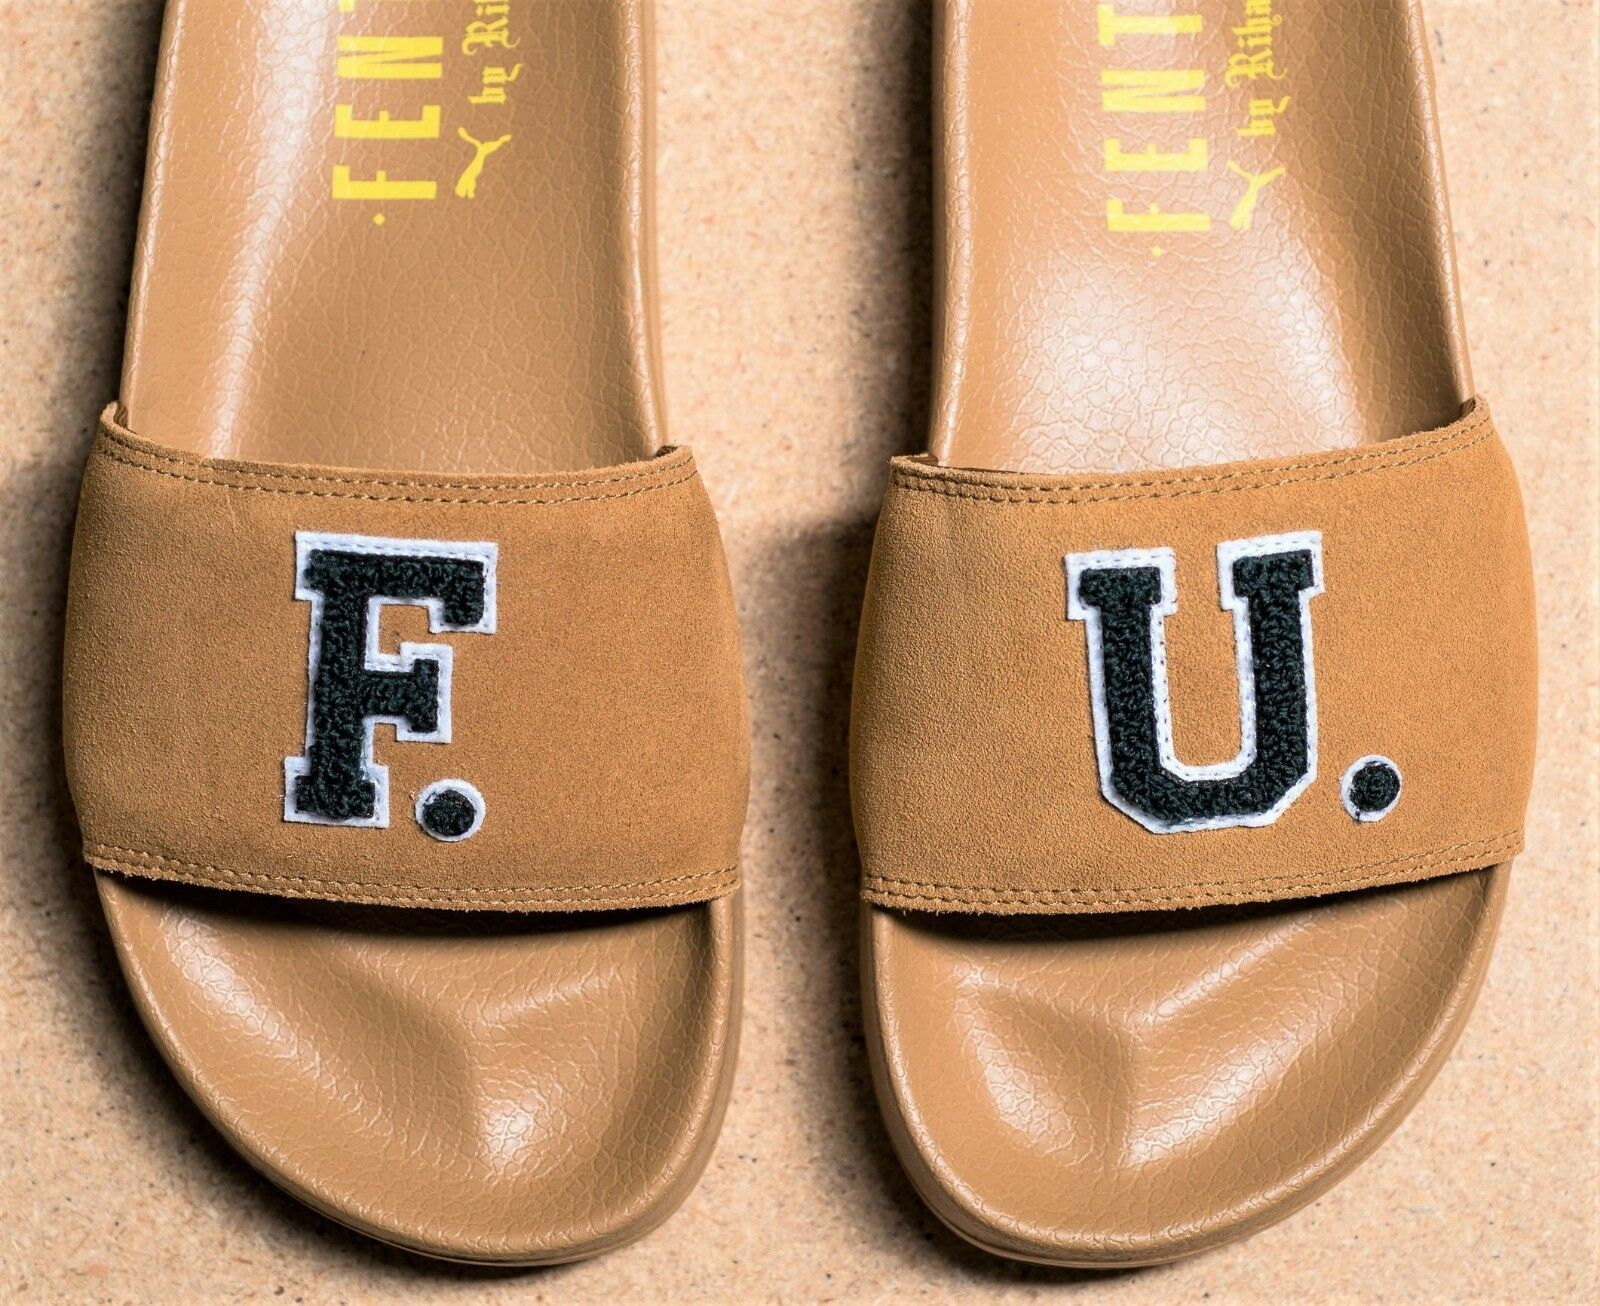 Puma F.U.' x Rihanna You 'leadcat F.U.' Puma Diapositiva Sandalias Flipflop unisex oro marrón 9 Nuevo En Caja 5fe9fb